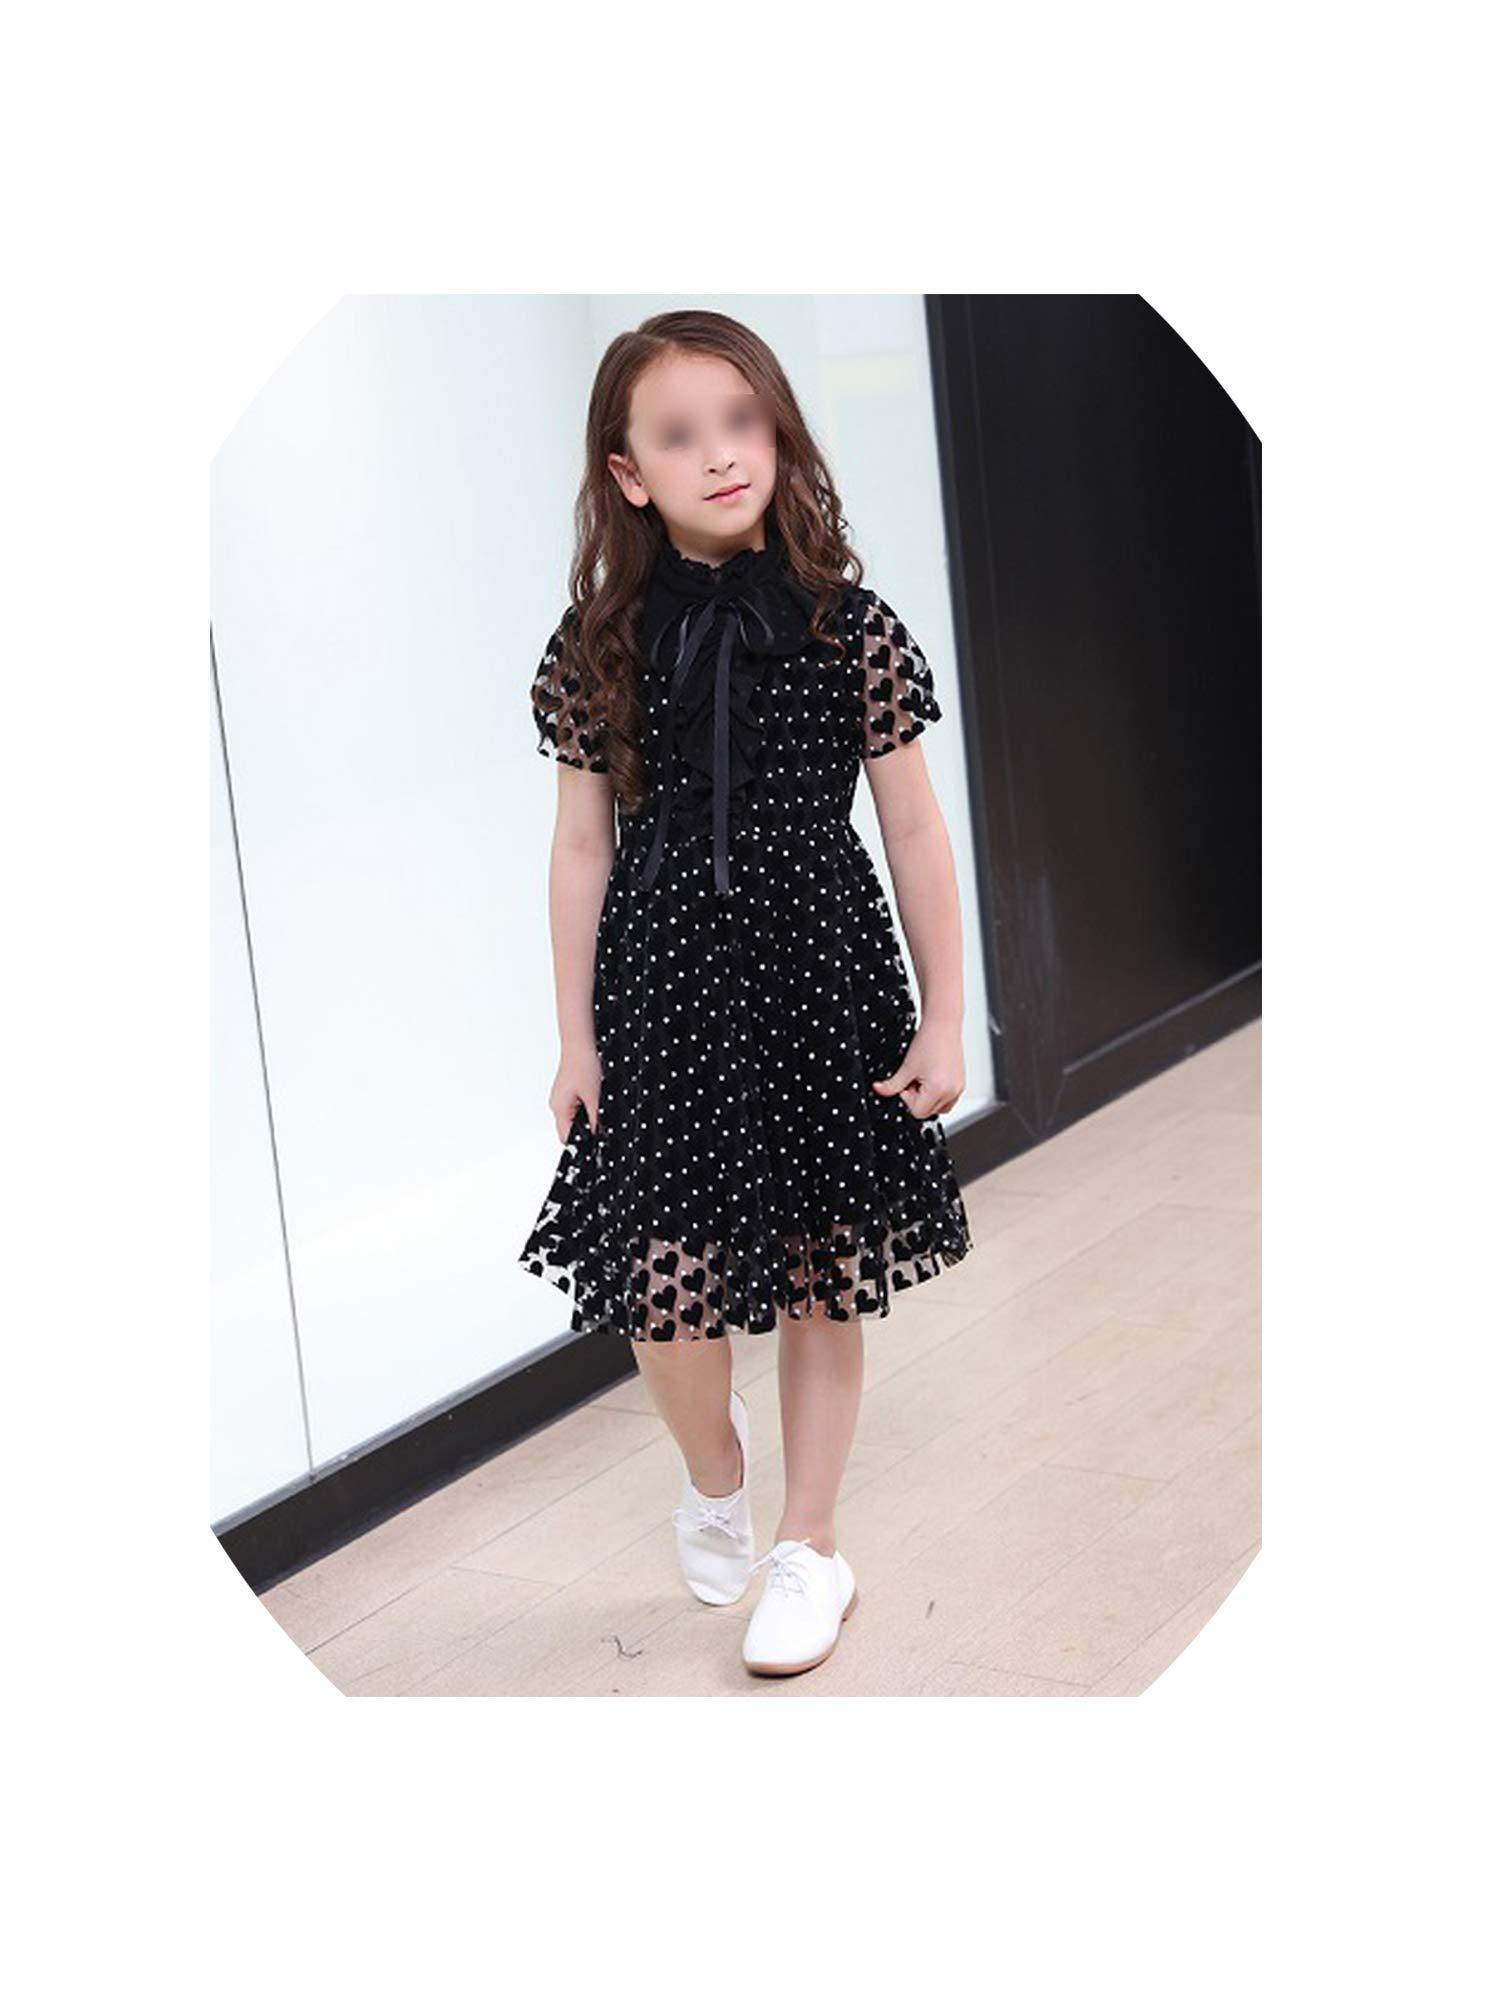 Kids Elegant Dress for Girls Costumes Teen Girl Summer Dresses Party Teenage Clothing Kids Casual Dresses for Children 6-16 Year, 8